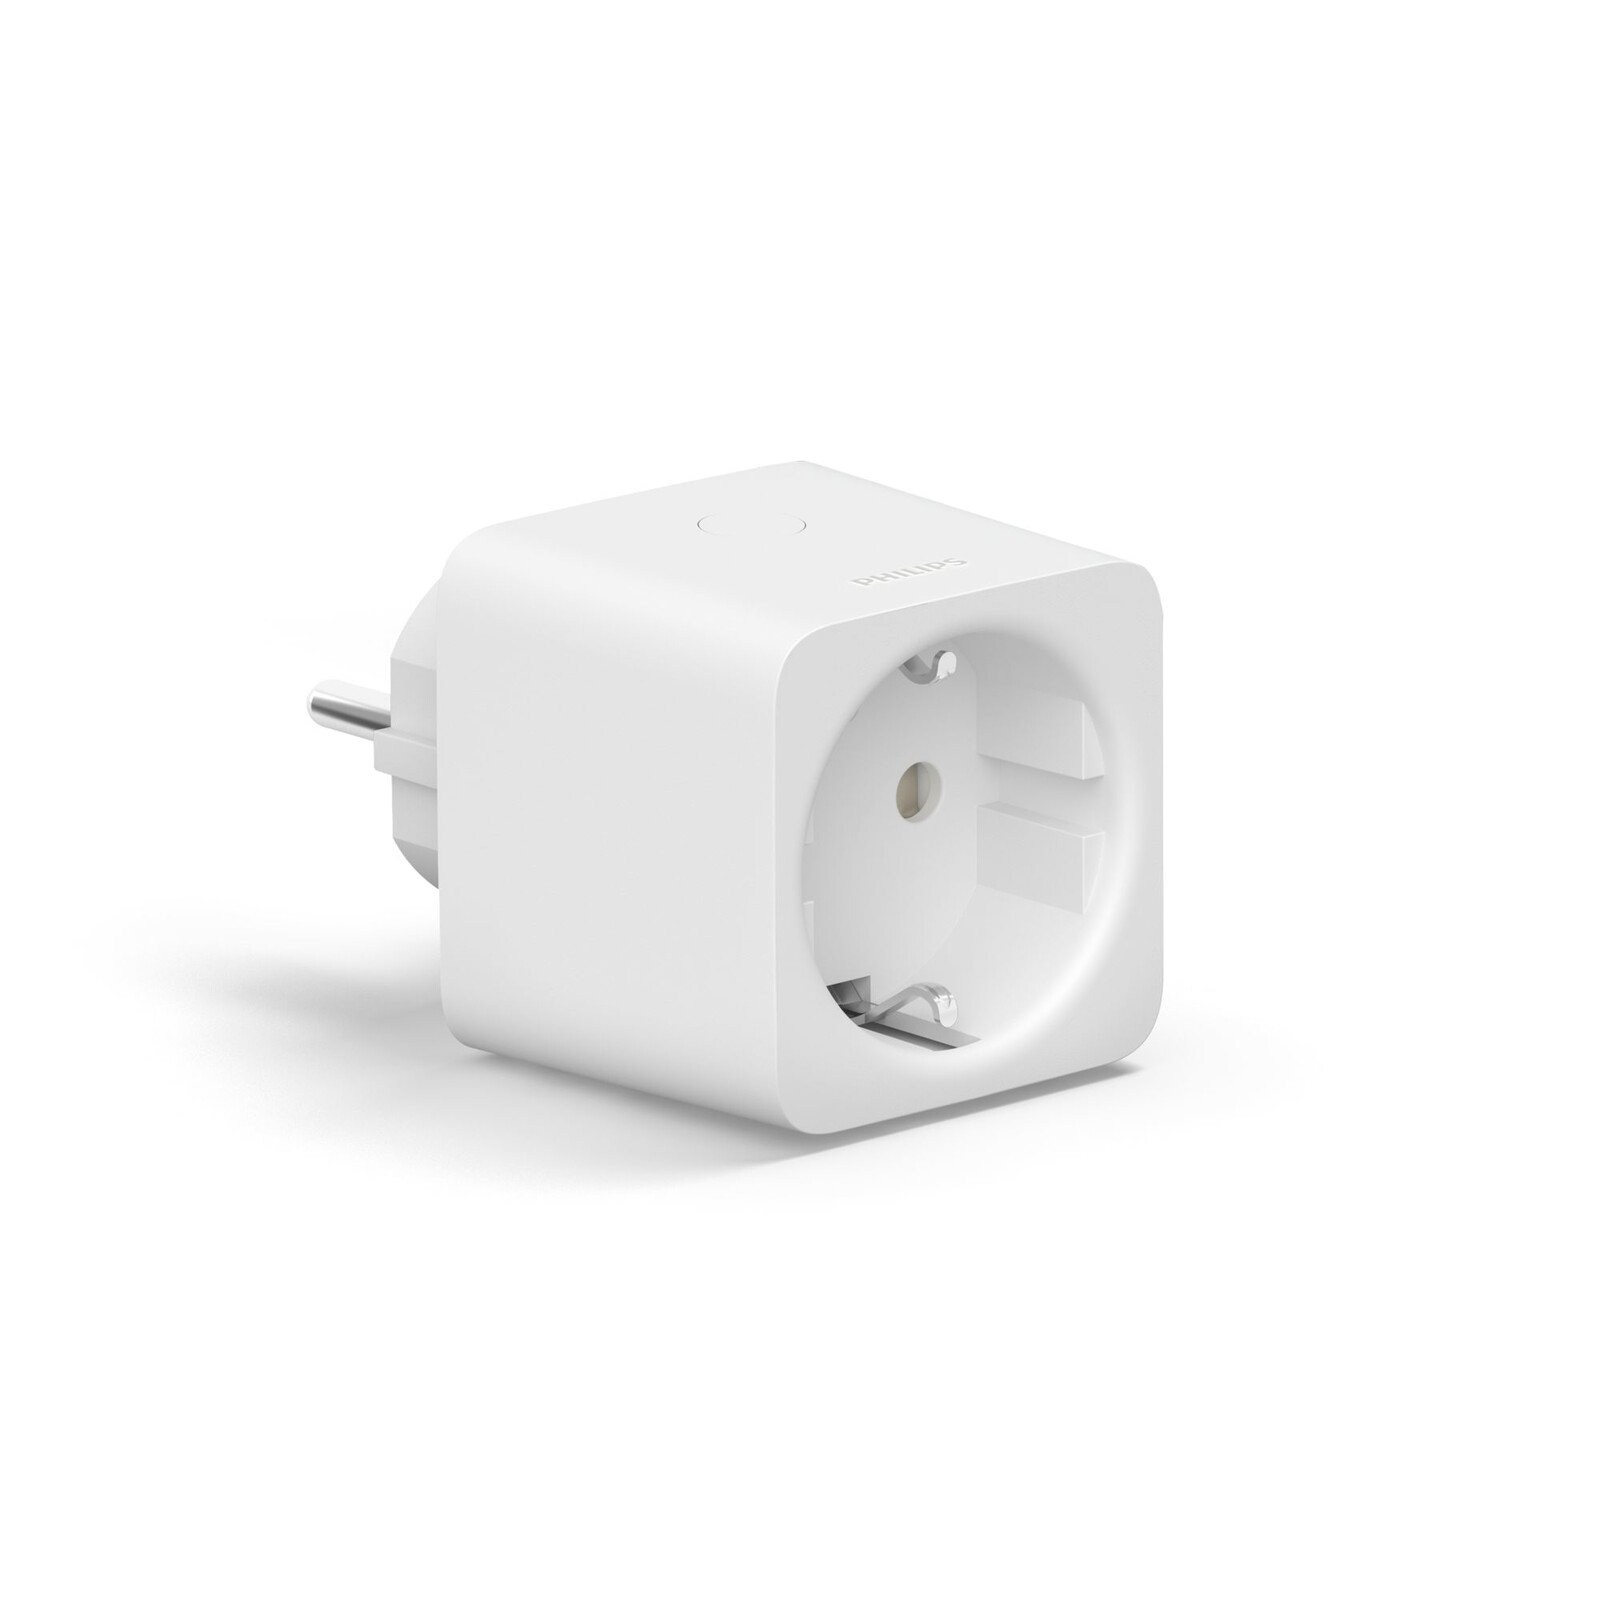 Philips Hue SmartPlug Steckdose weiß